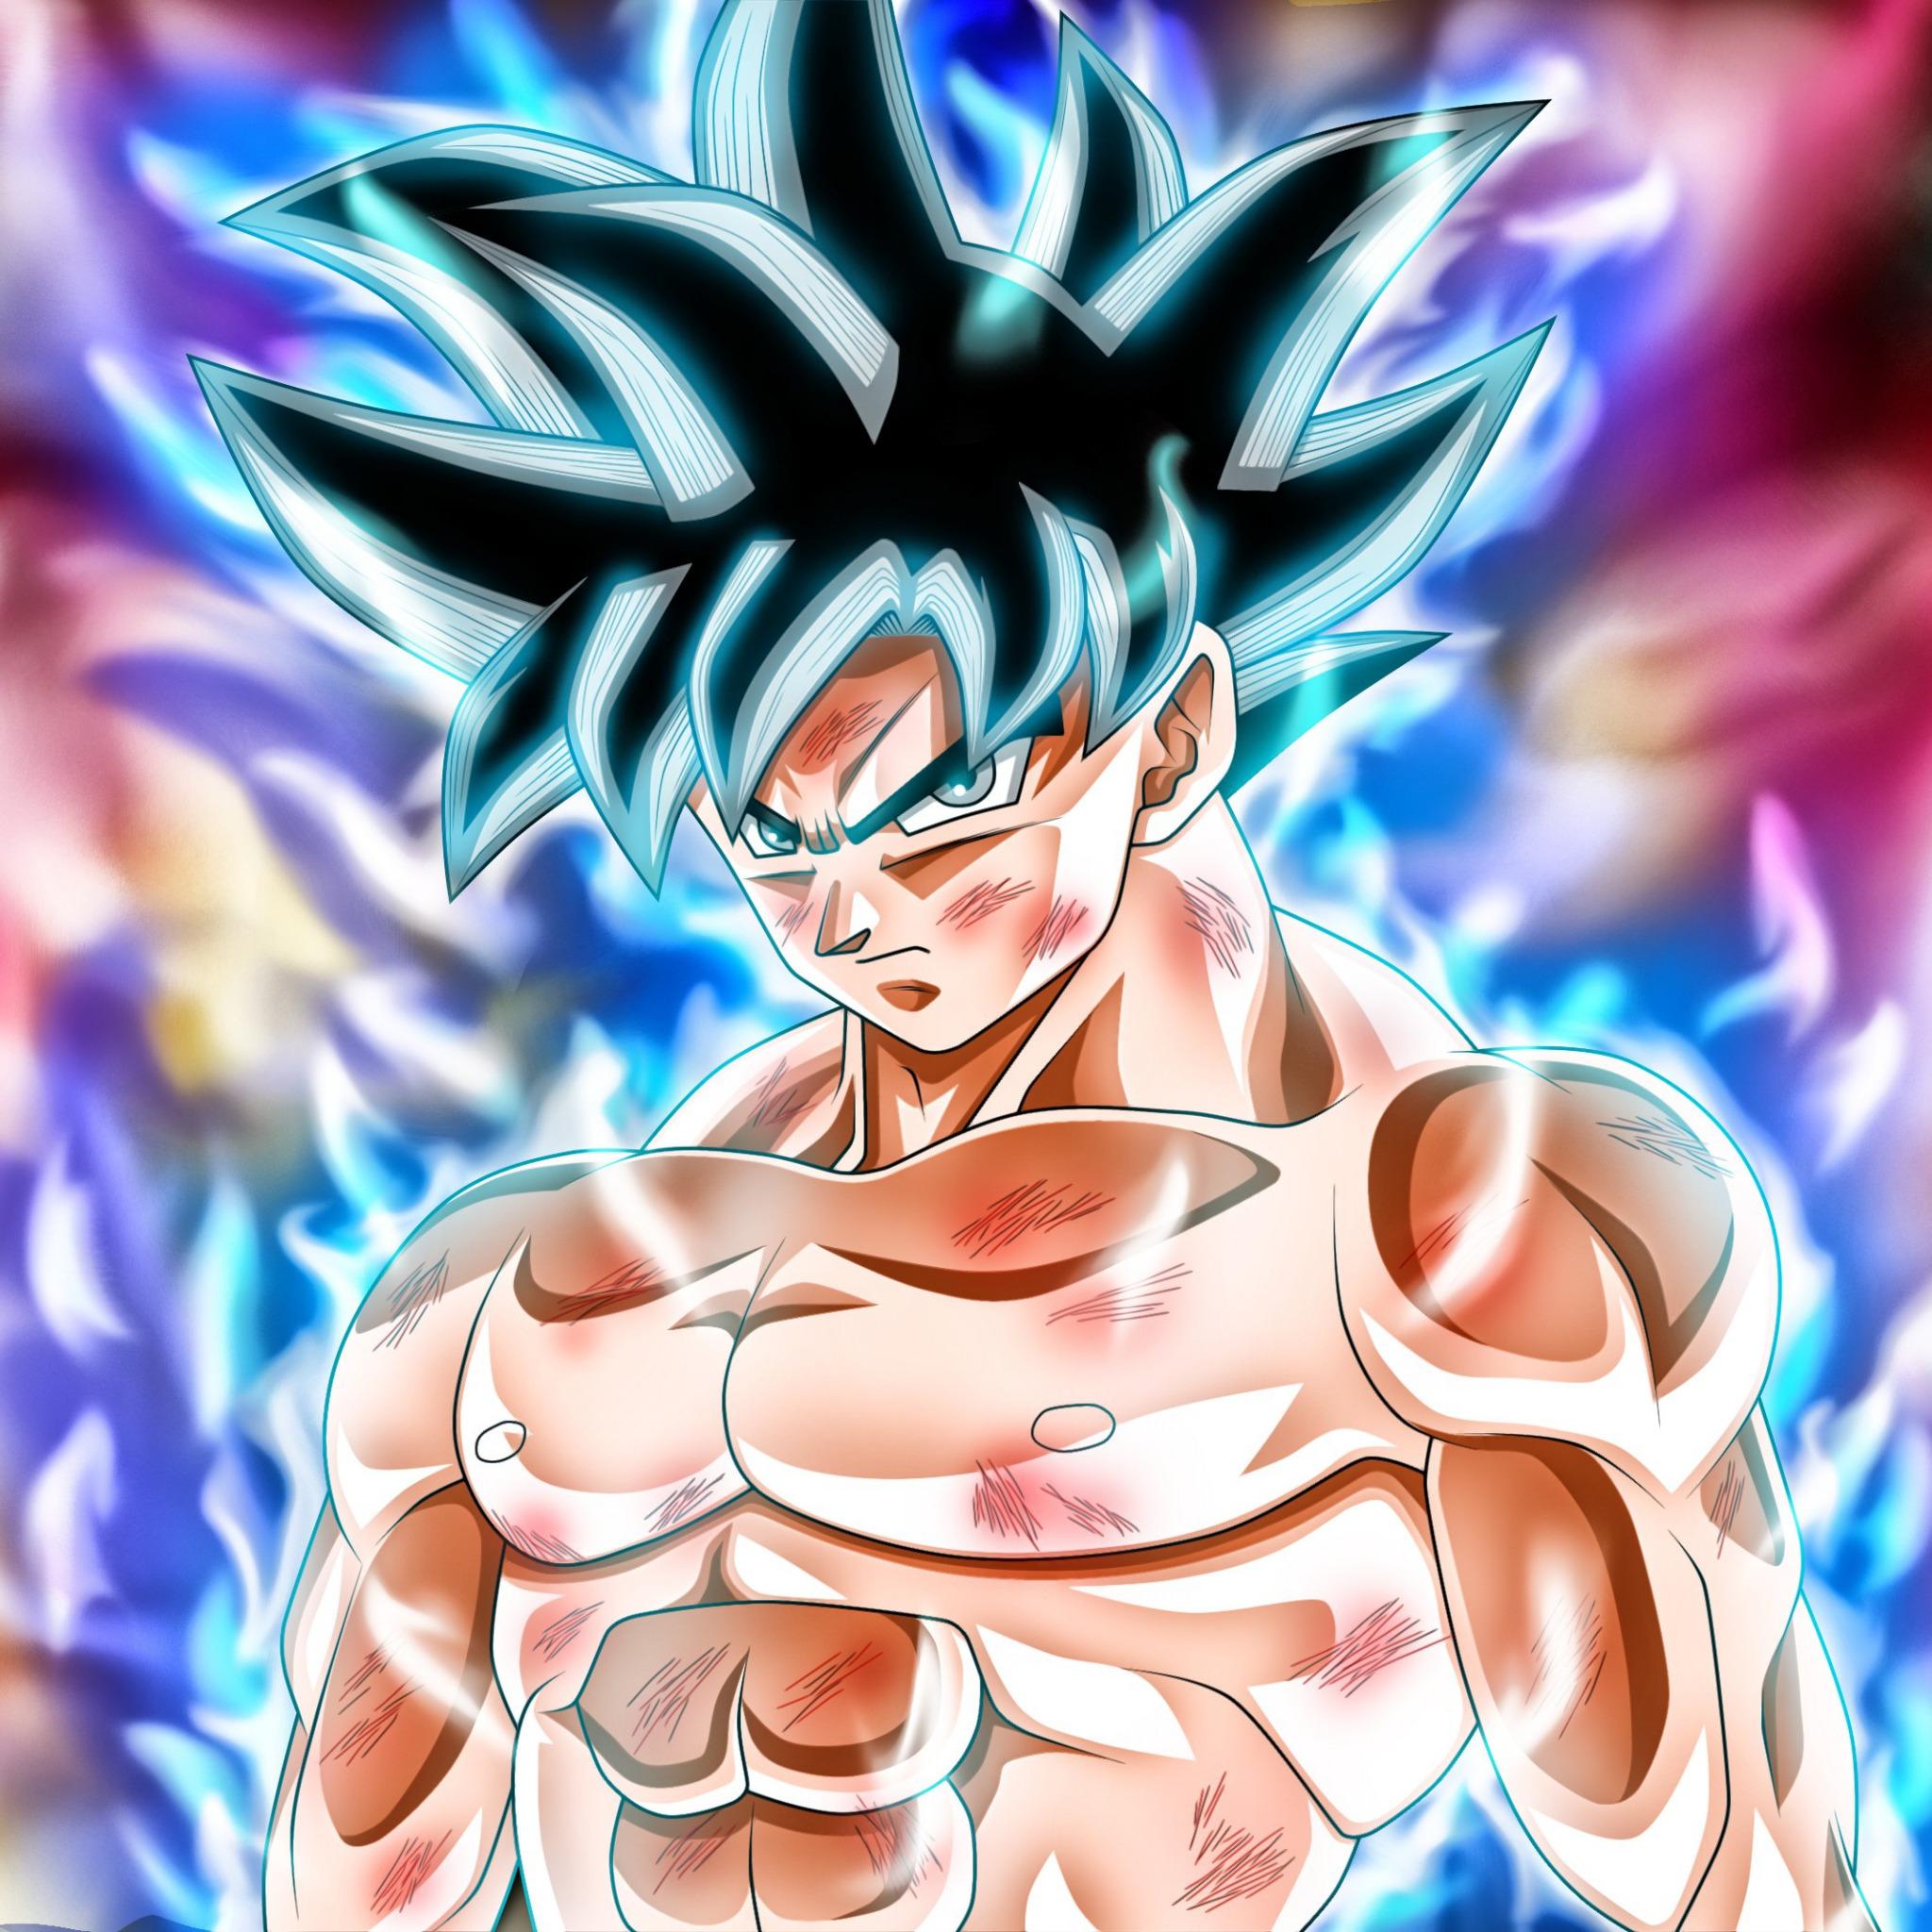 Скачать обои DBS, game, alien, anime, manga, Son Goku, power